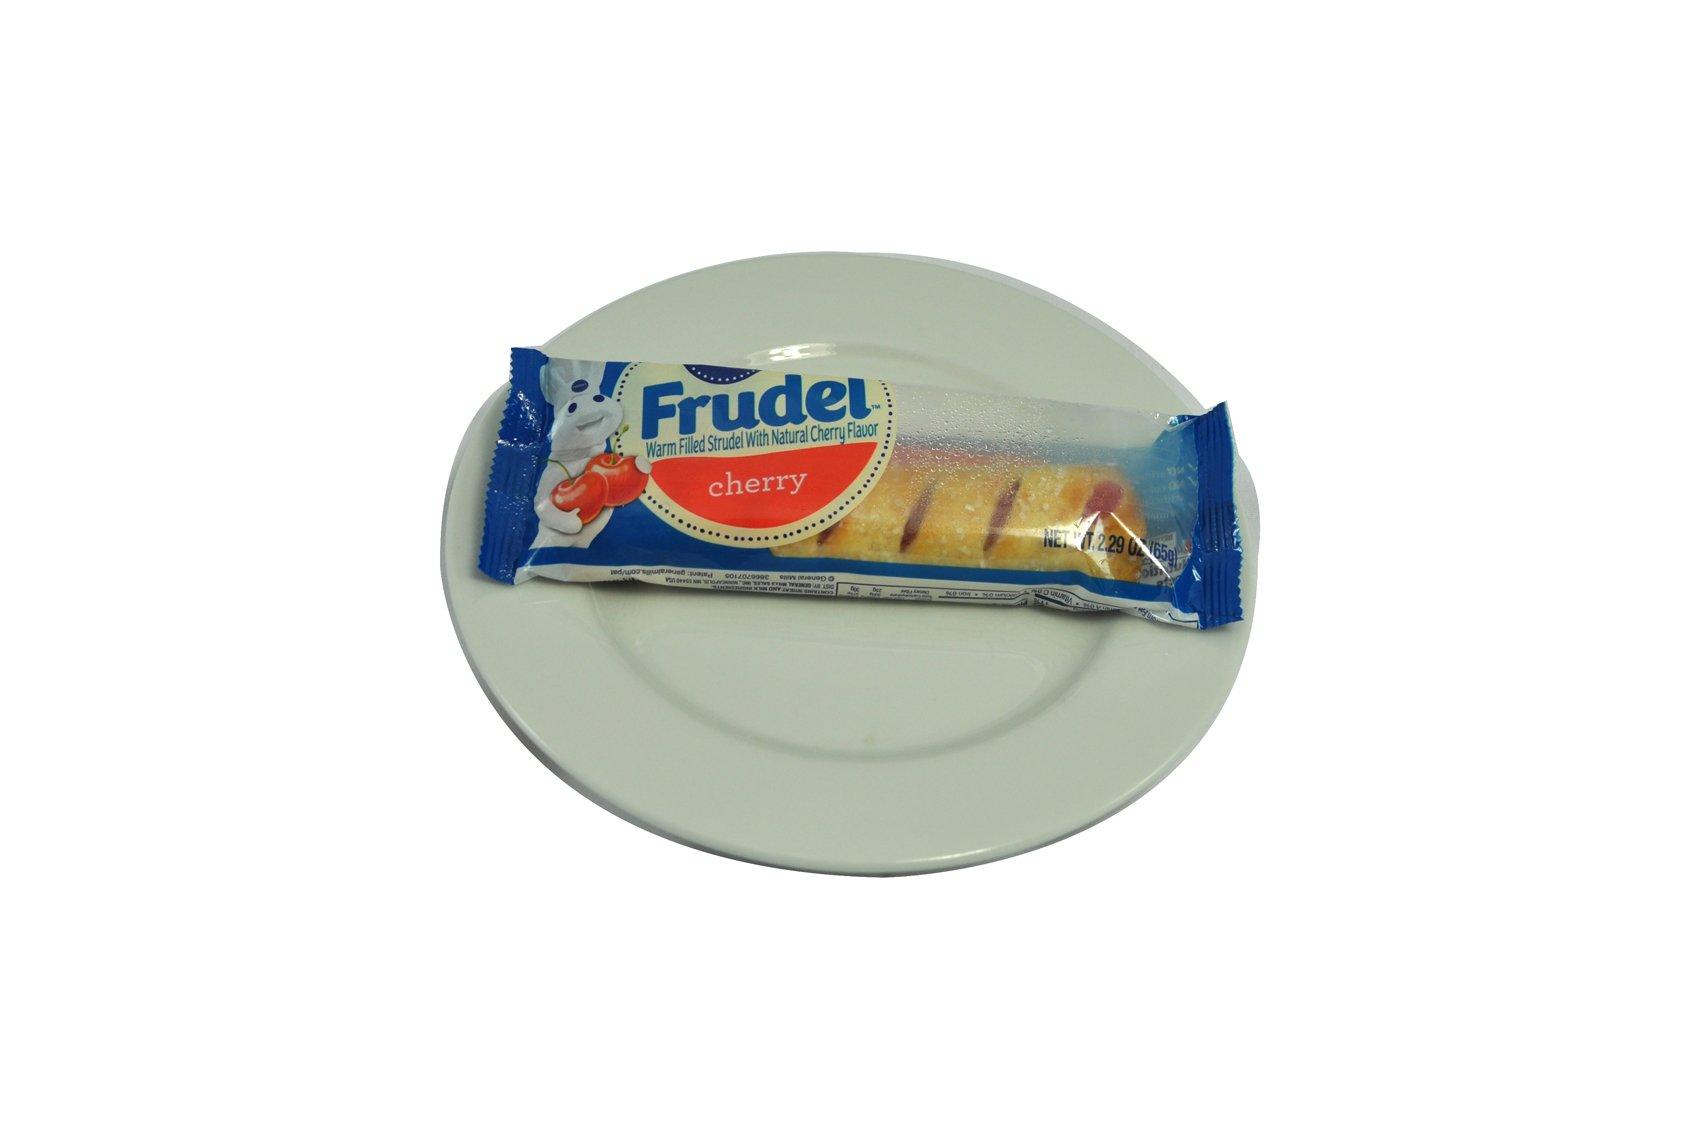 Pillsbury Frudel, Cherry Strudel, 2.29 oz., (72 per case)